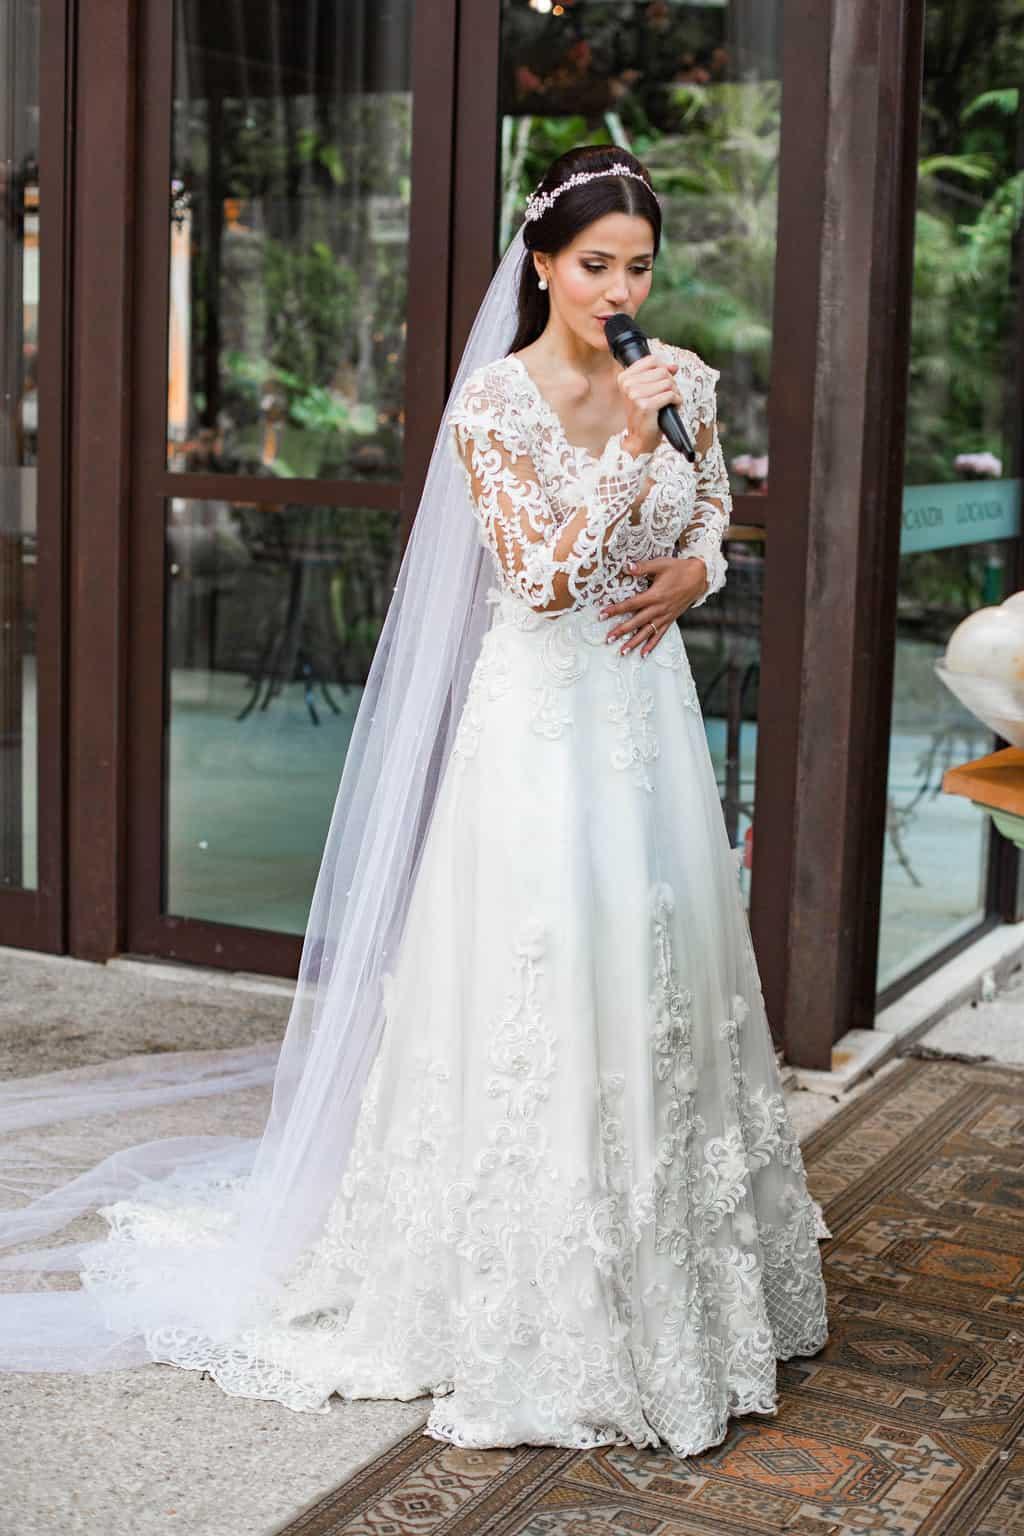 casamento-Beatriz-e-Joao-Fernando-cerimonia-ao-ar-livre-Itaipava-Locanda-Della-Mimosa-Thienny-Tammis127